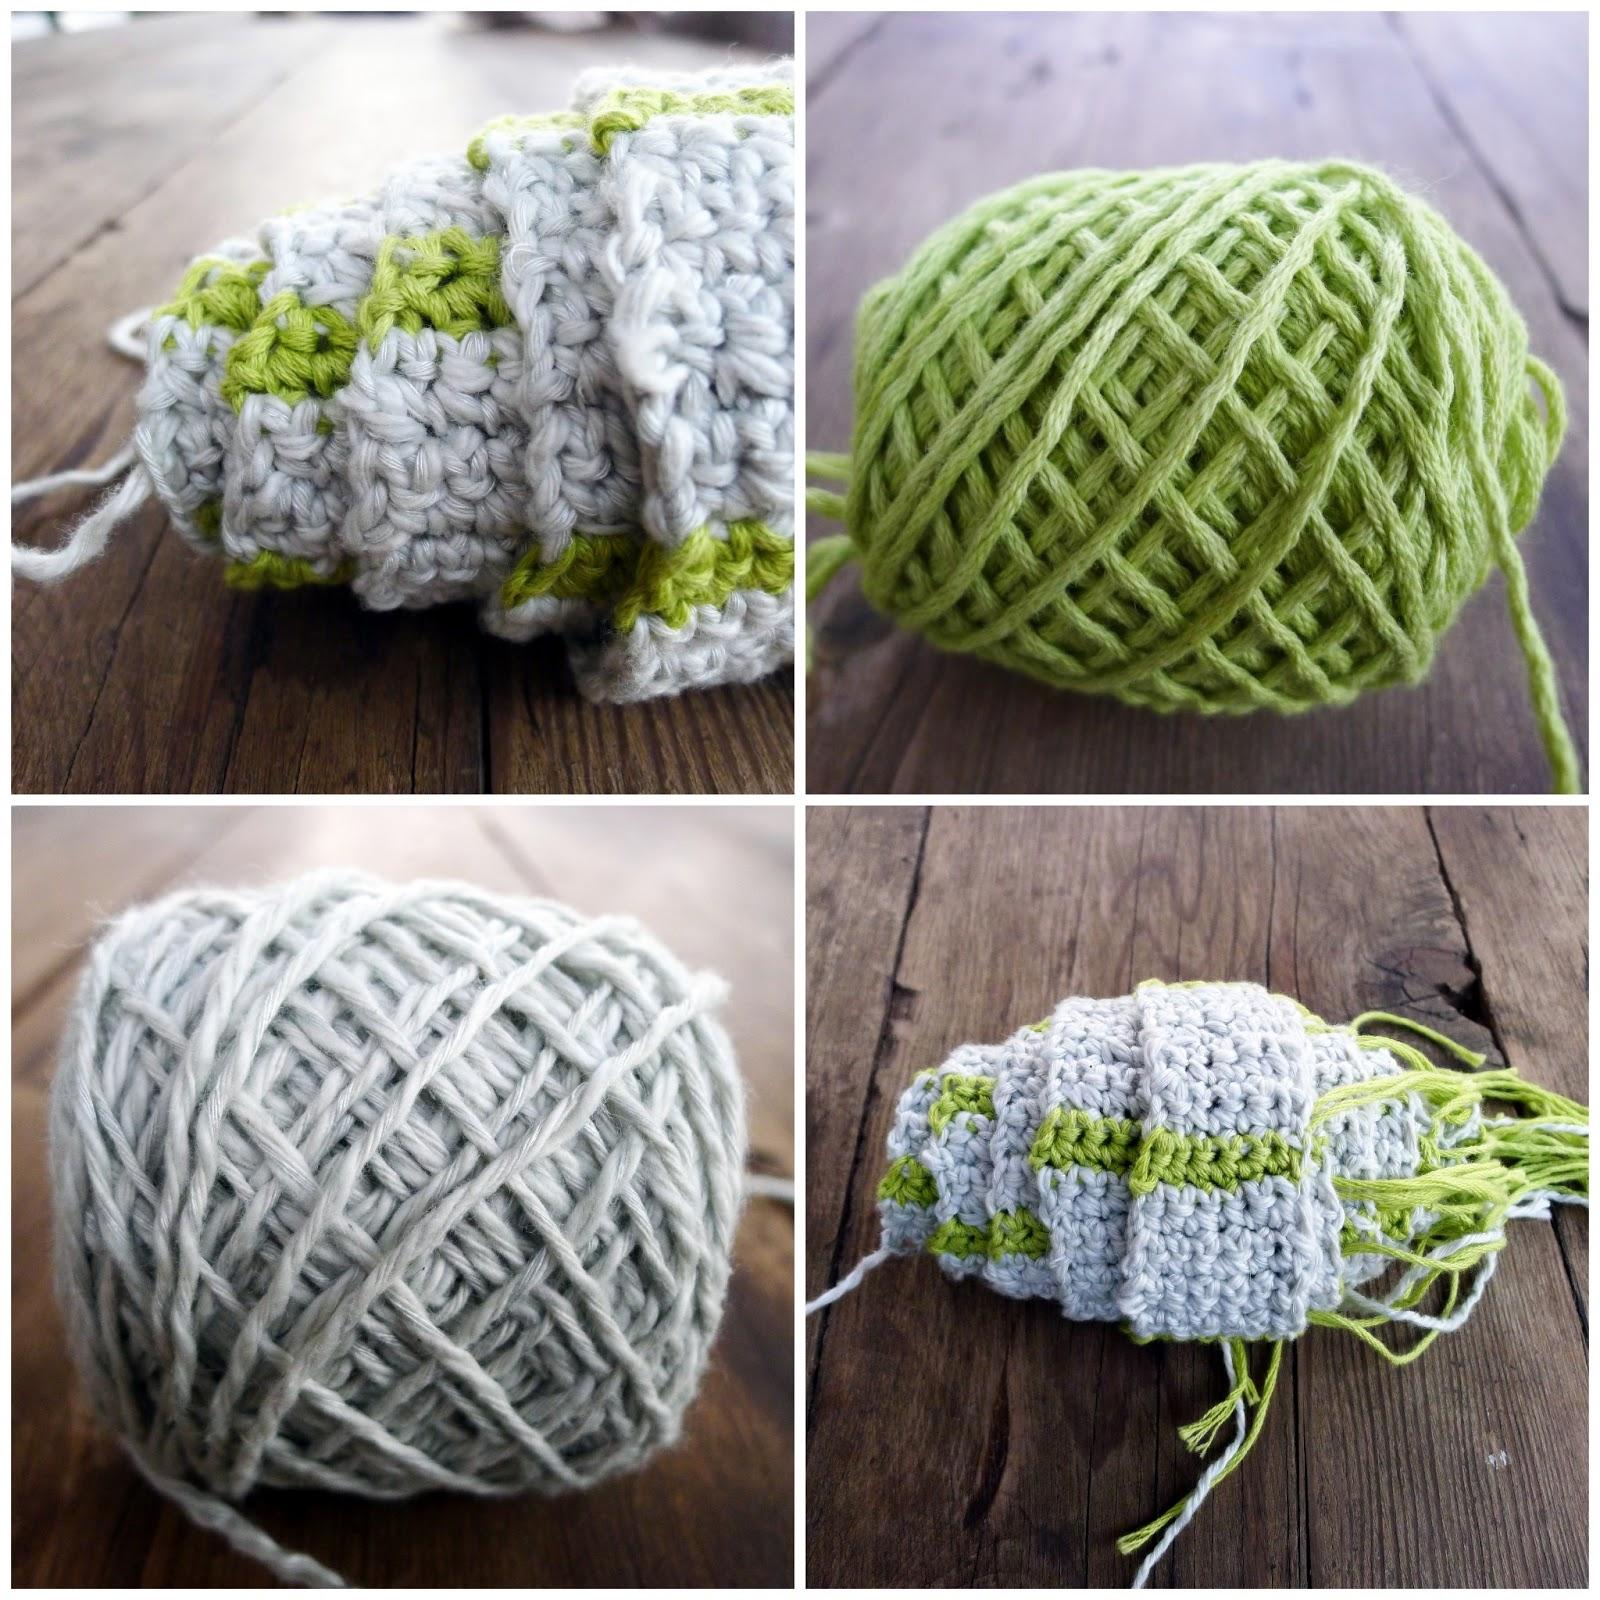 Pigtails Skinny Crochet Baktus Scarf